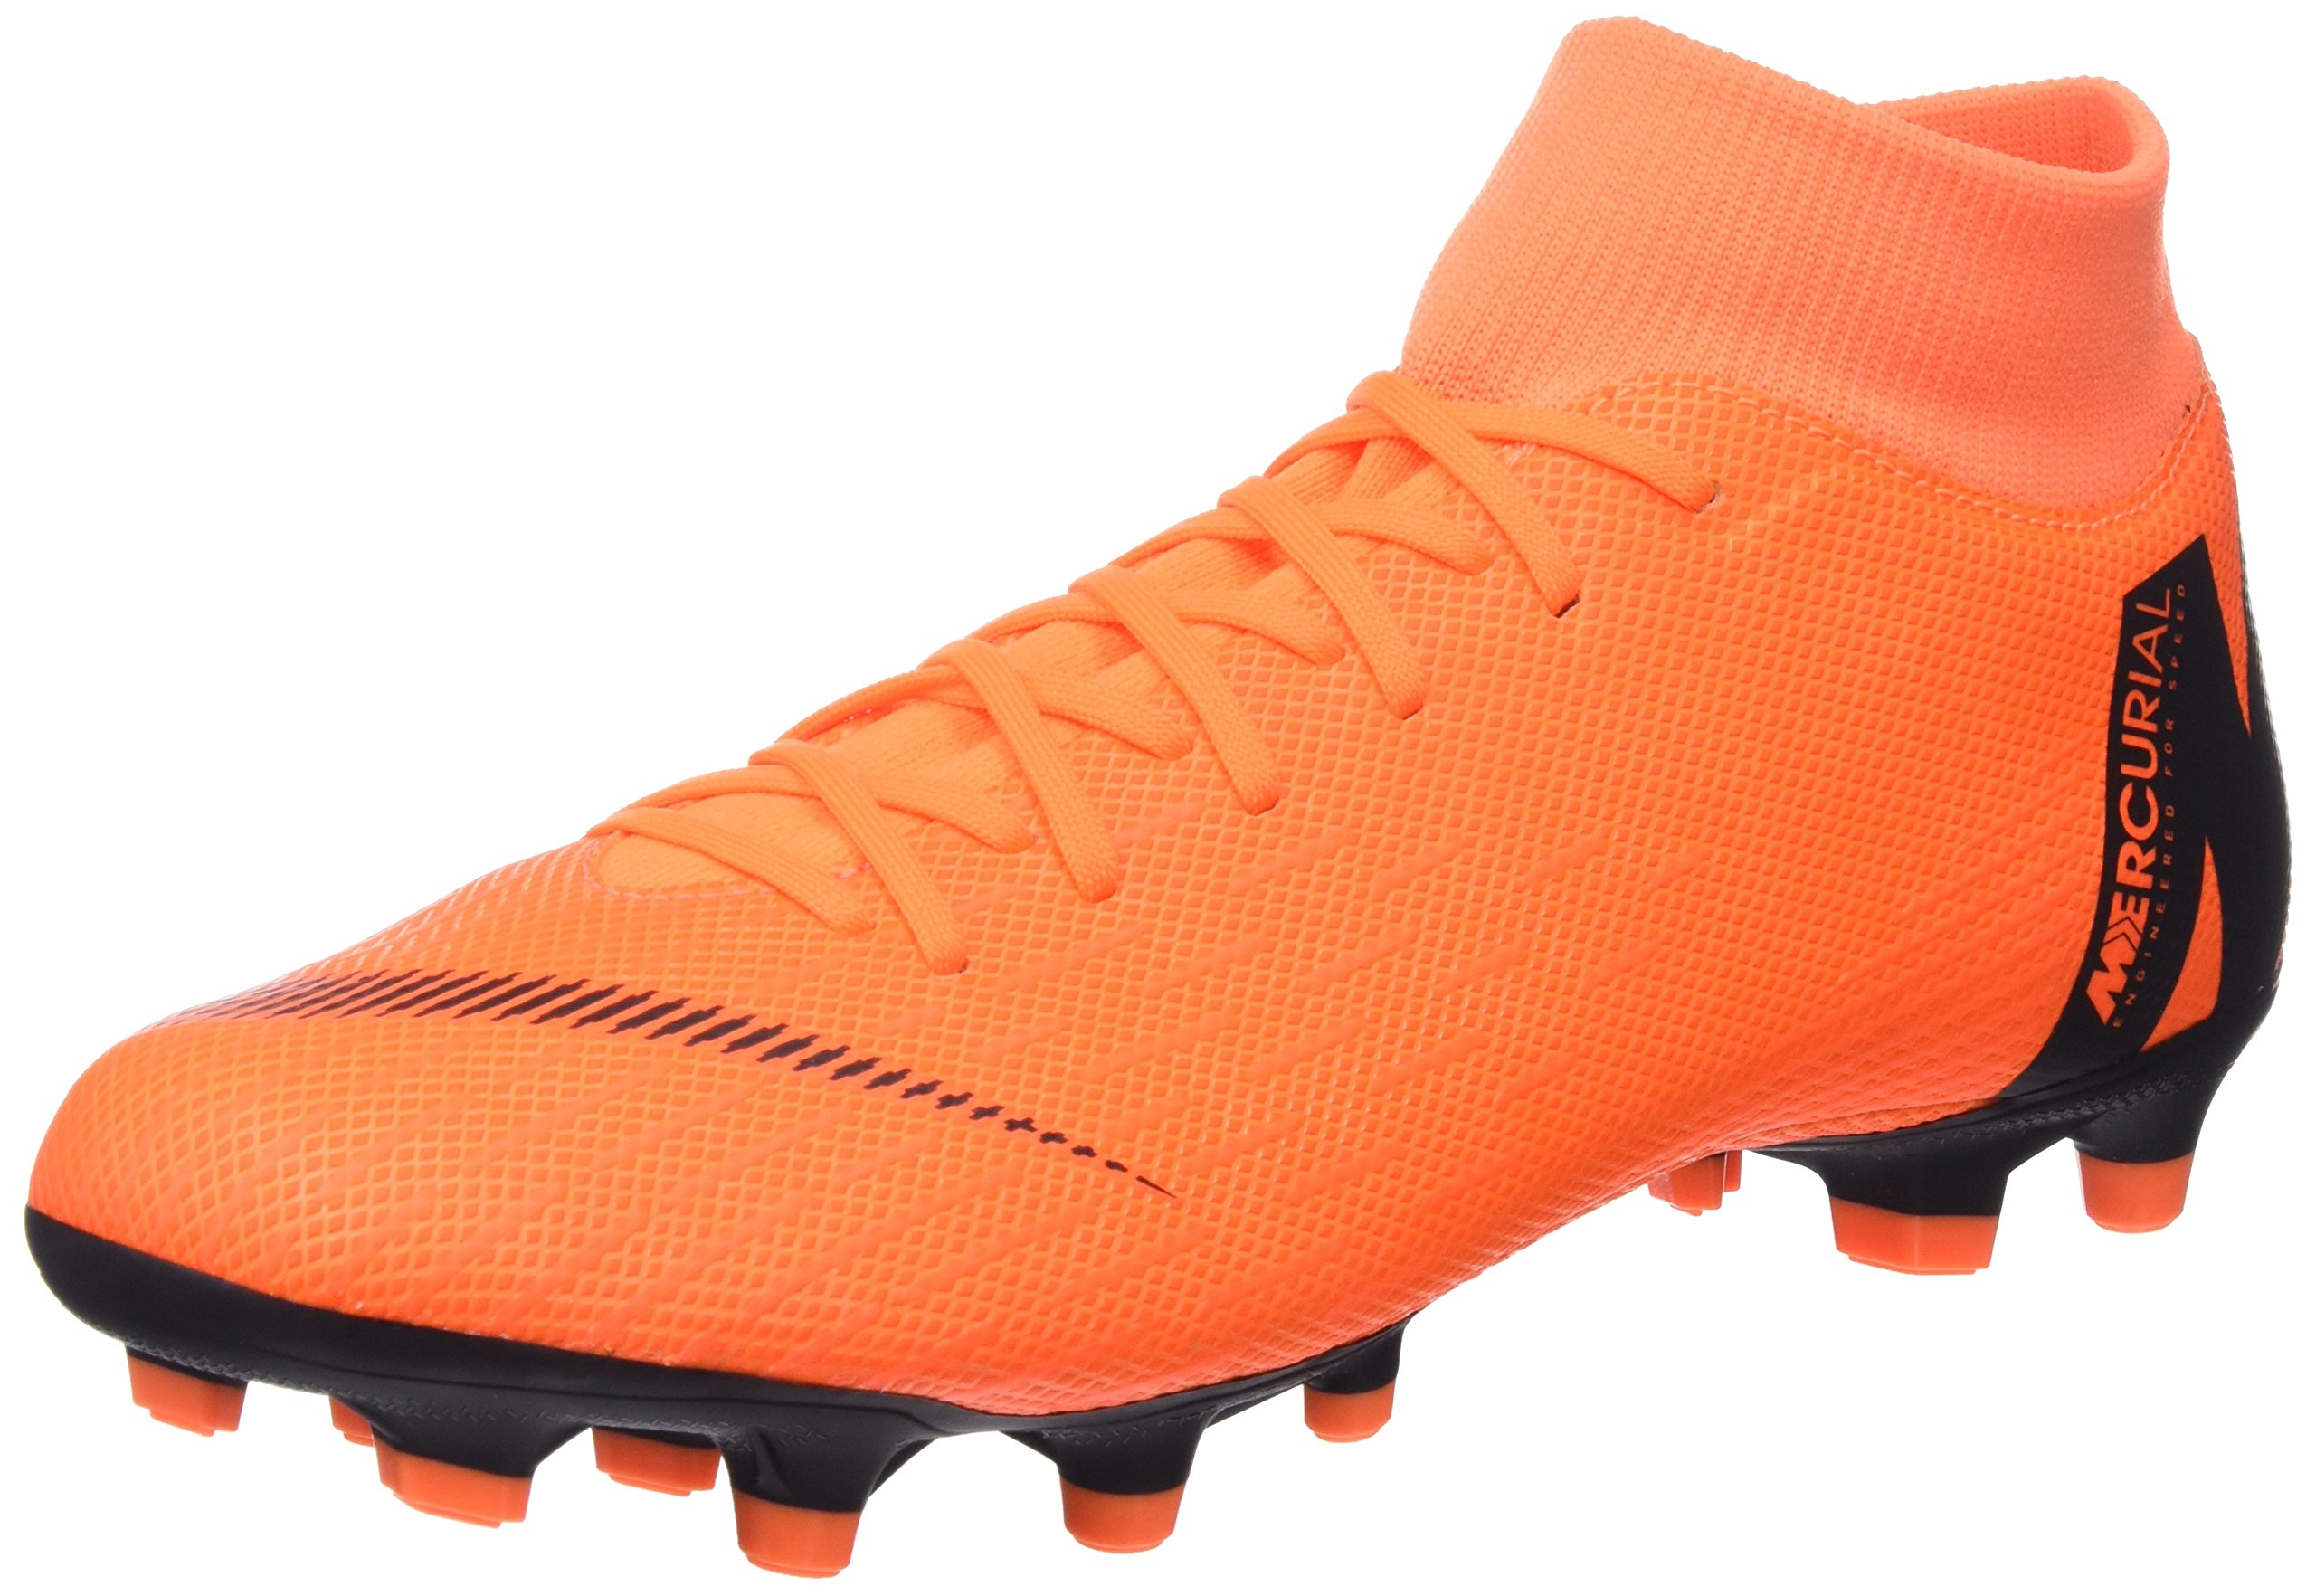 5b803c16b3345 Nike Superfly VI Academy FG Men s Soccer Firm Ground Cleats (6.5 D(M)